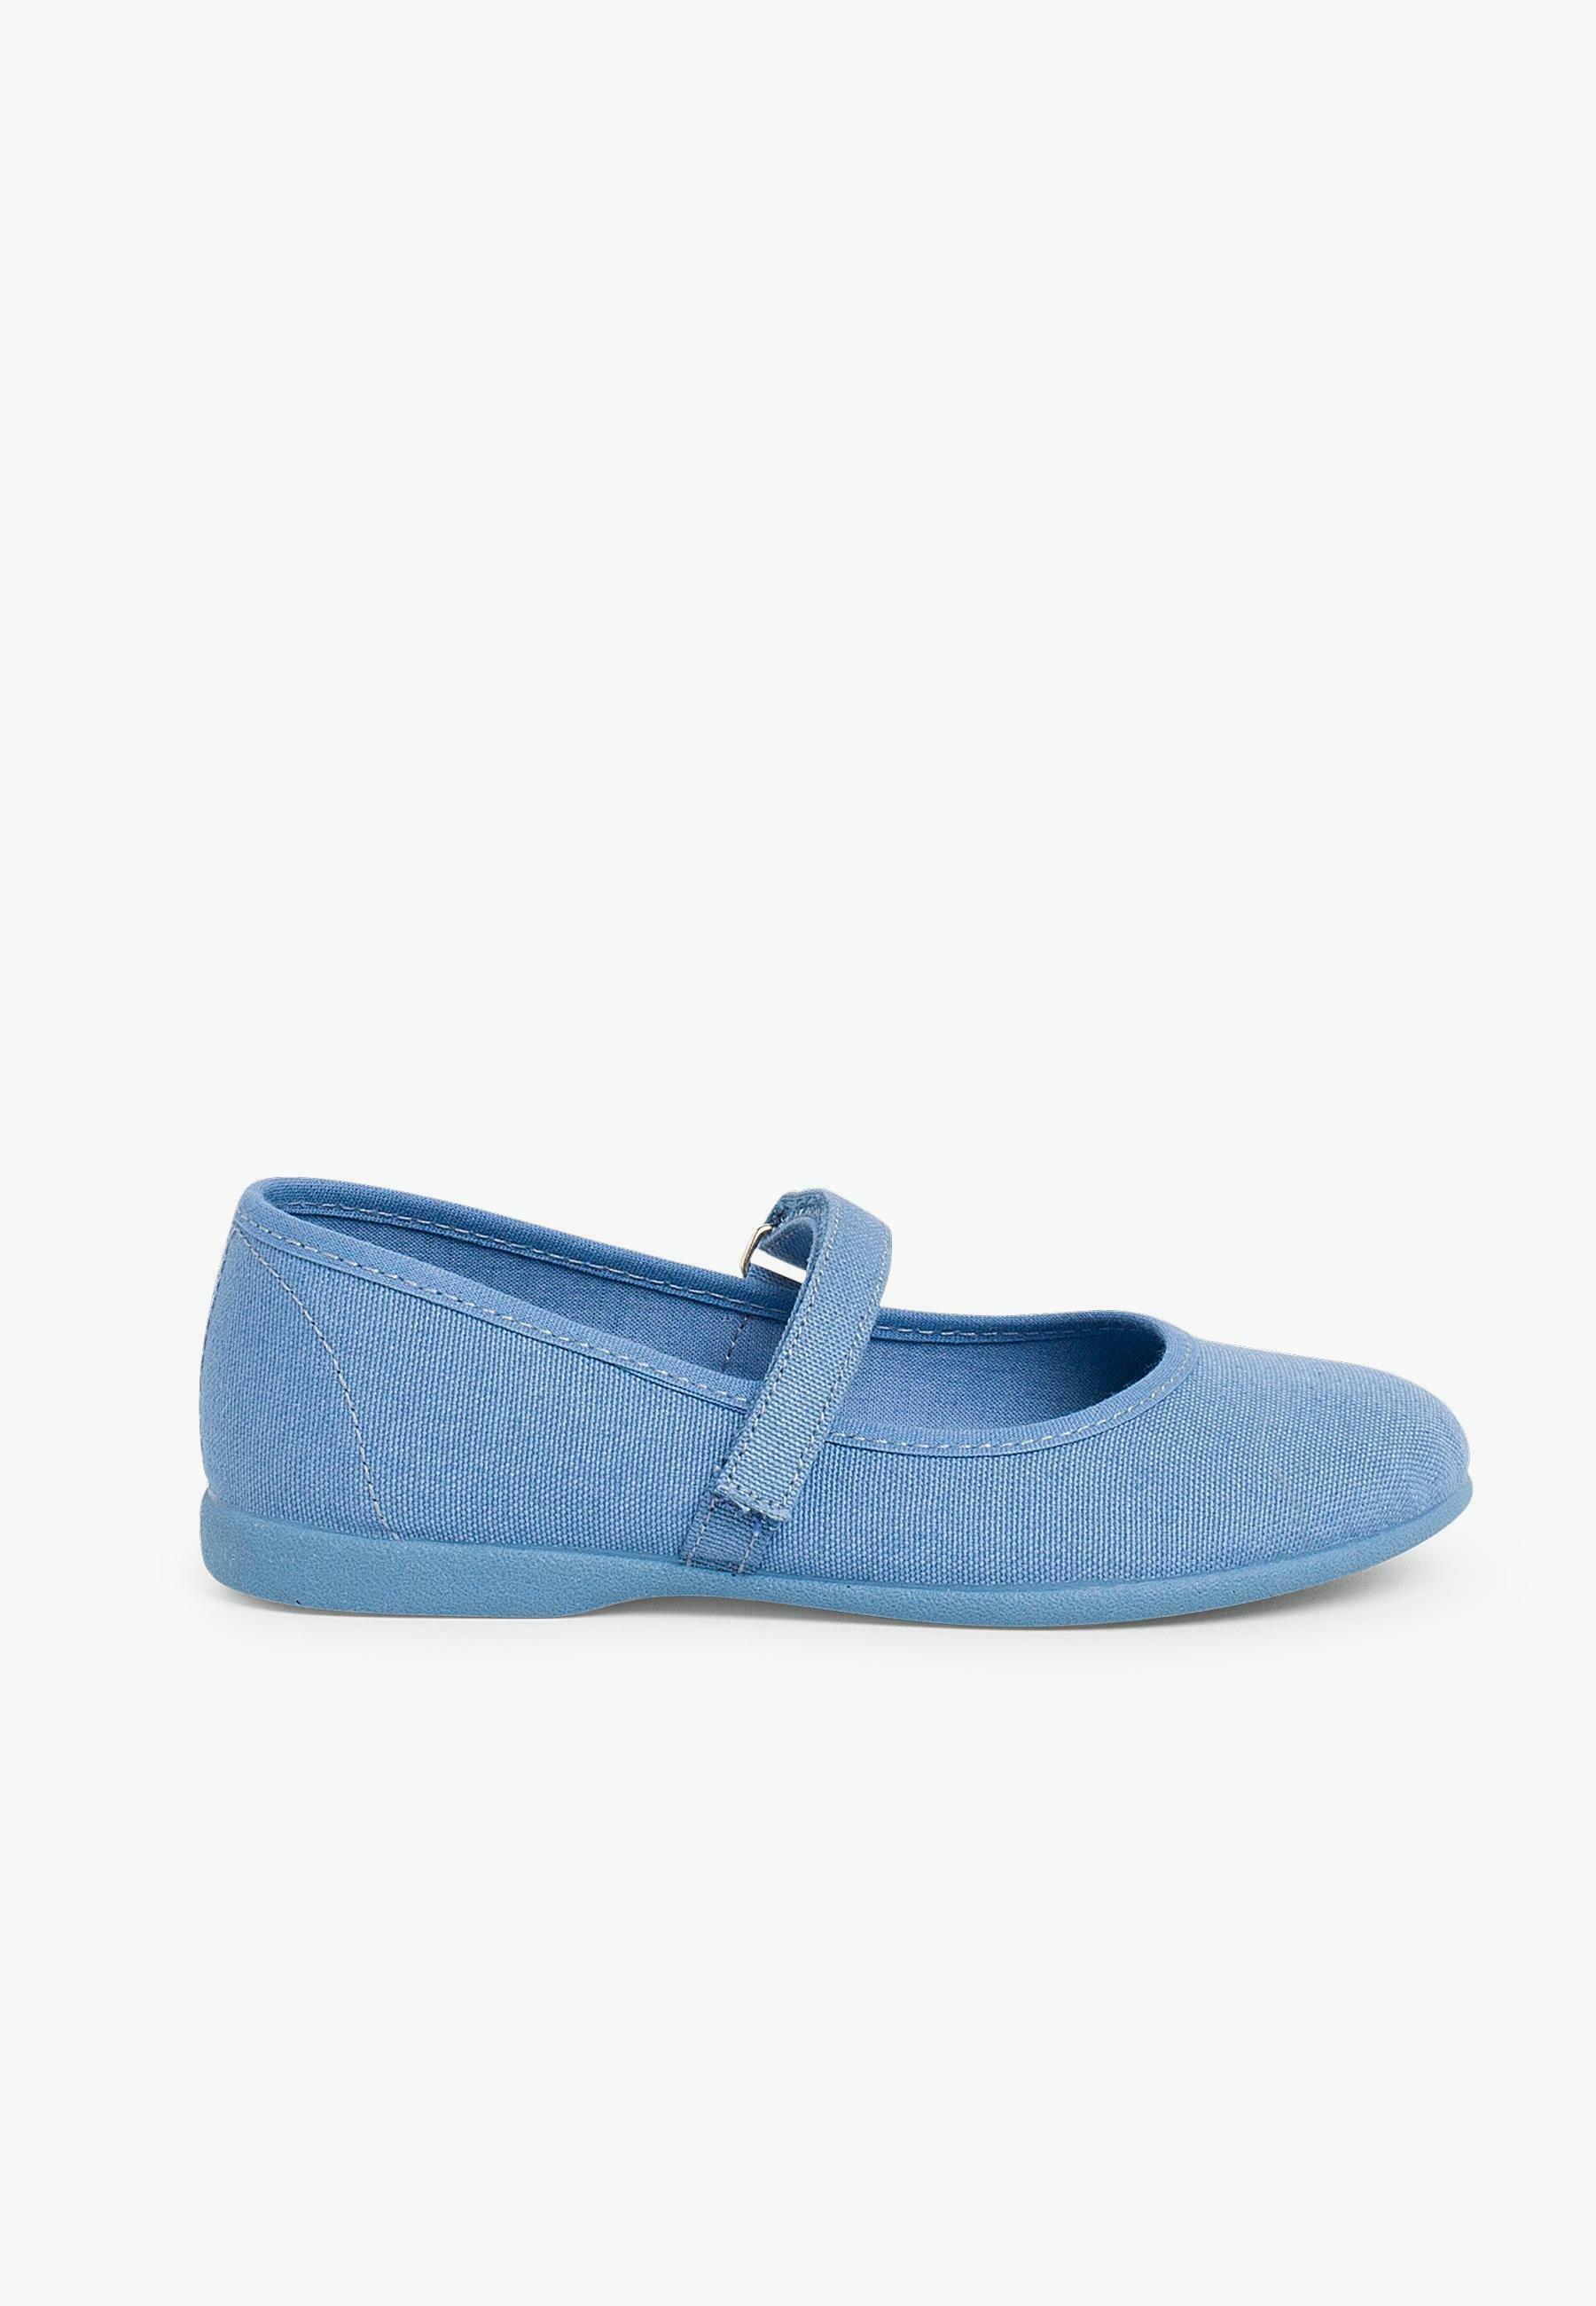 Enfant TELA TIRA ADHERENTE FINA - Chaussures premiers pas